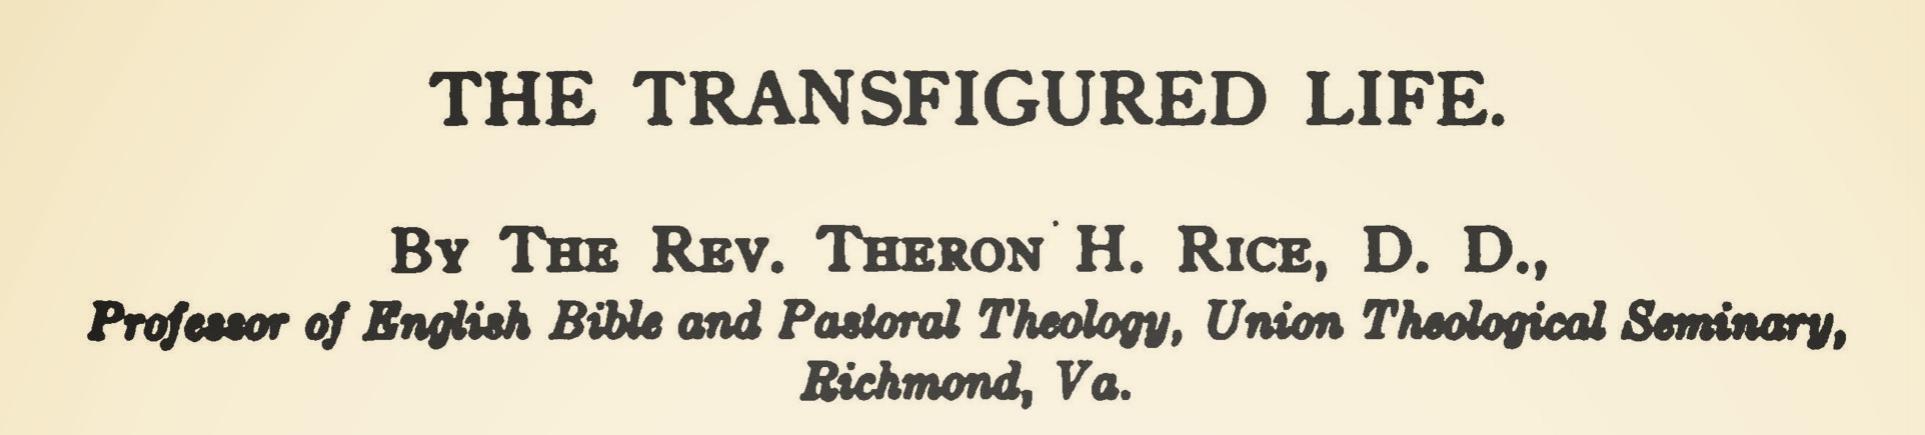 Rice, Jr., Theron Hall, The Transfigured Life Title Page.jpg